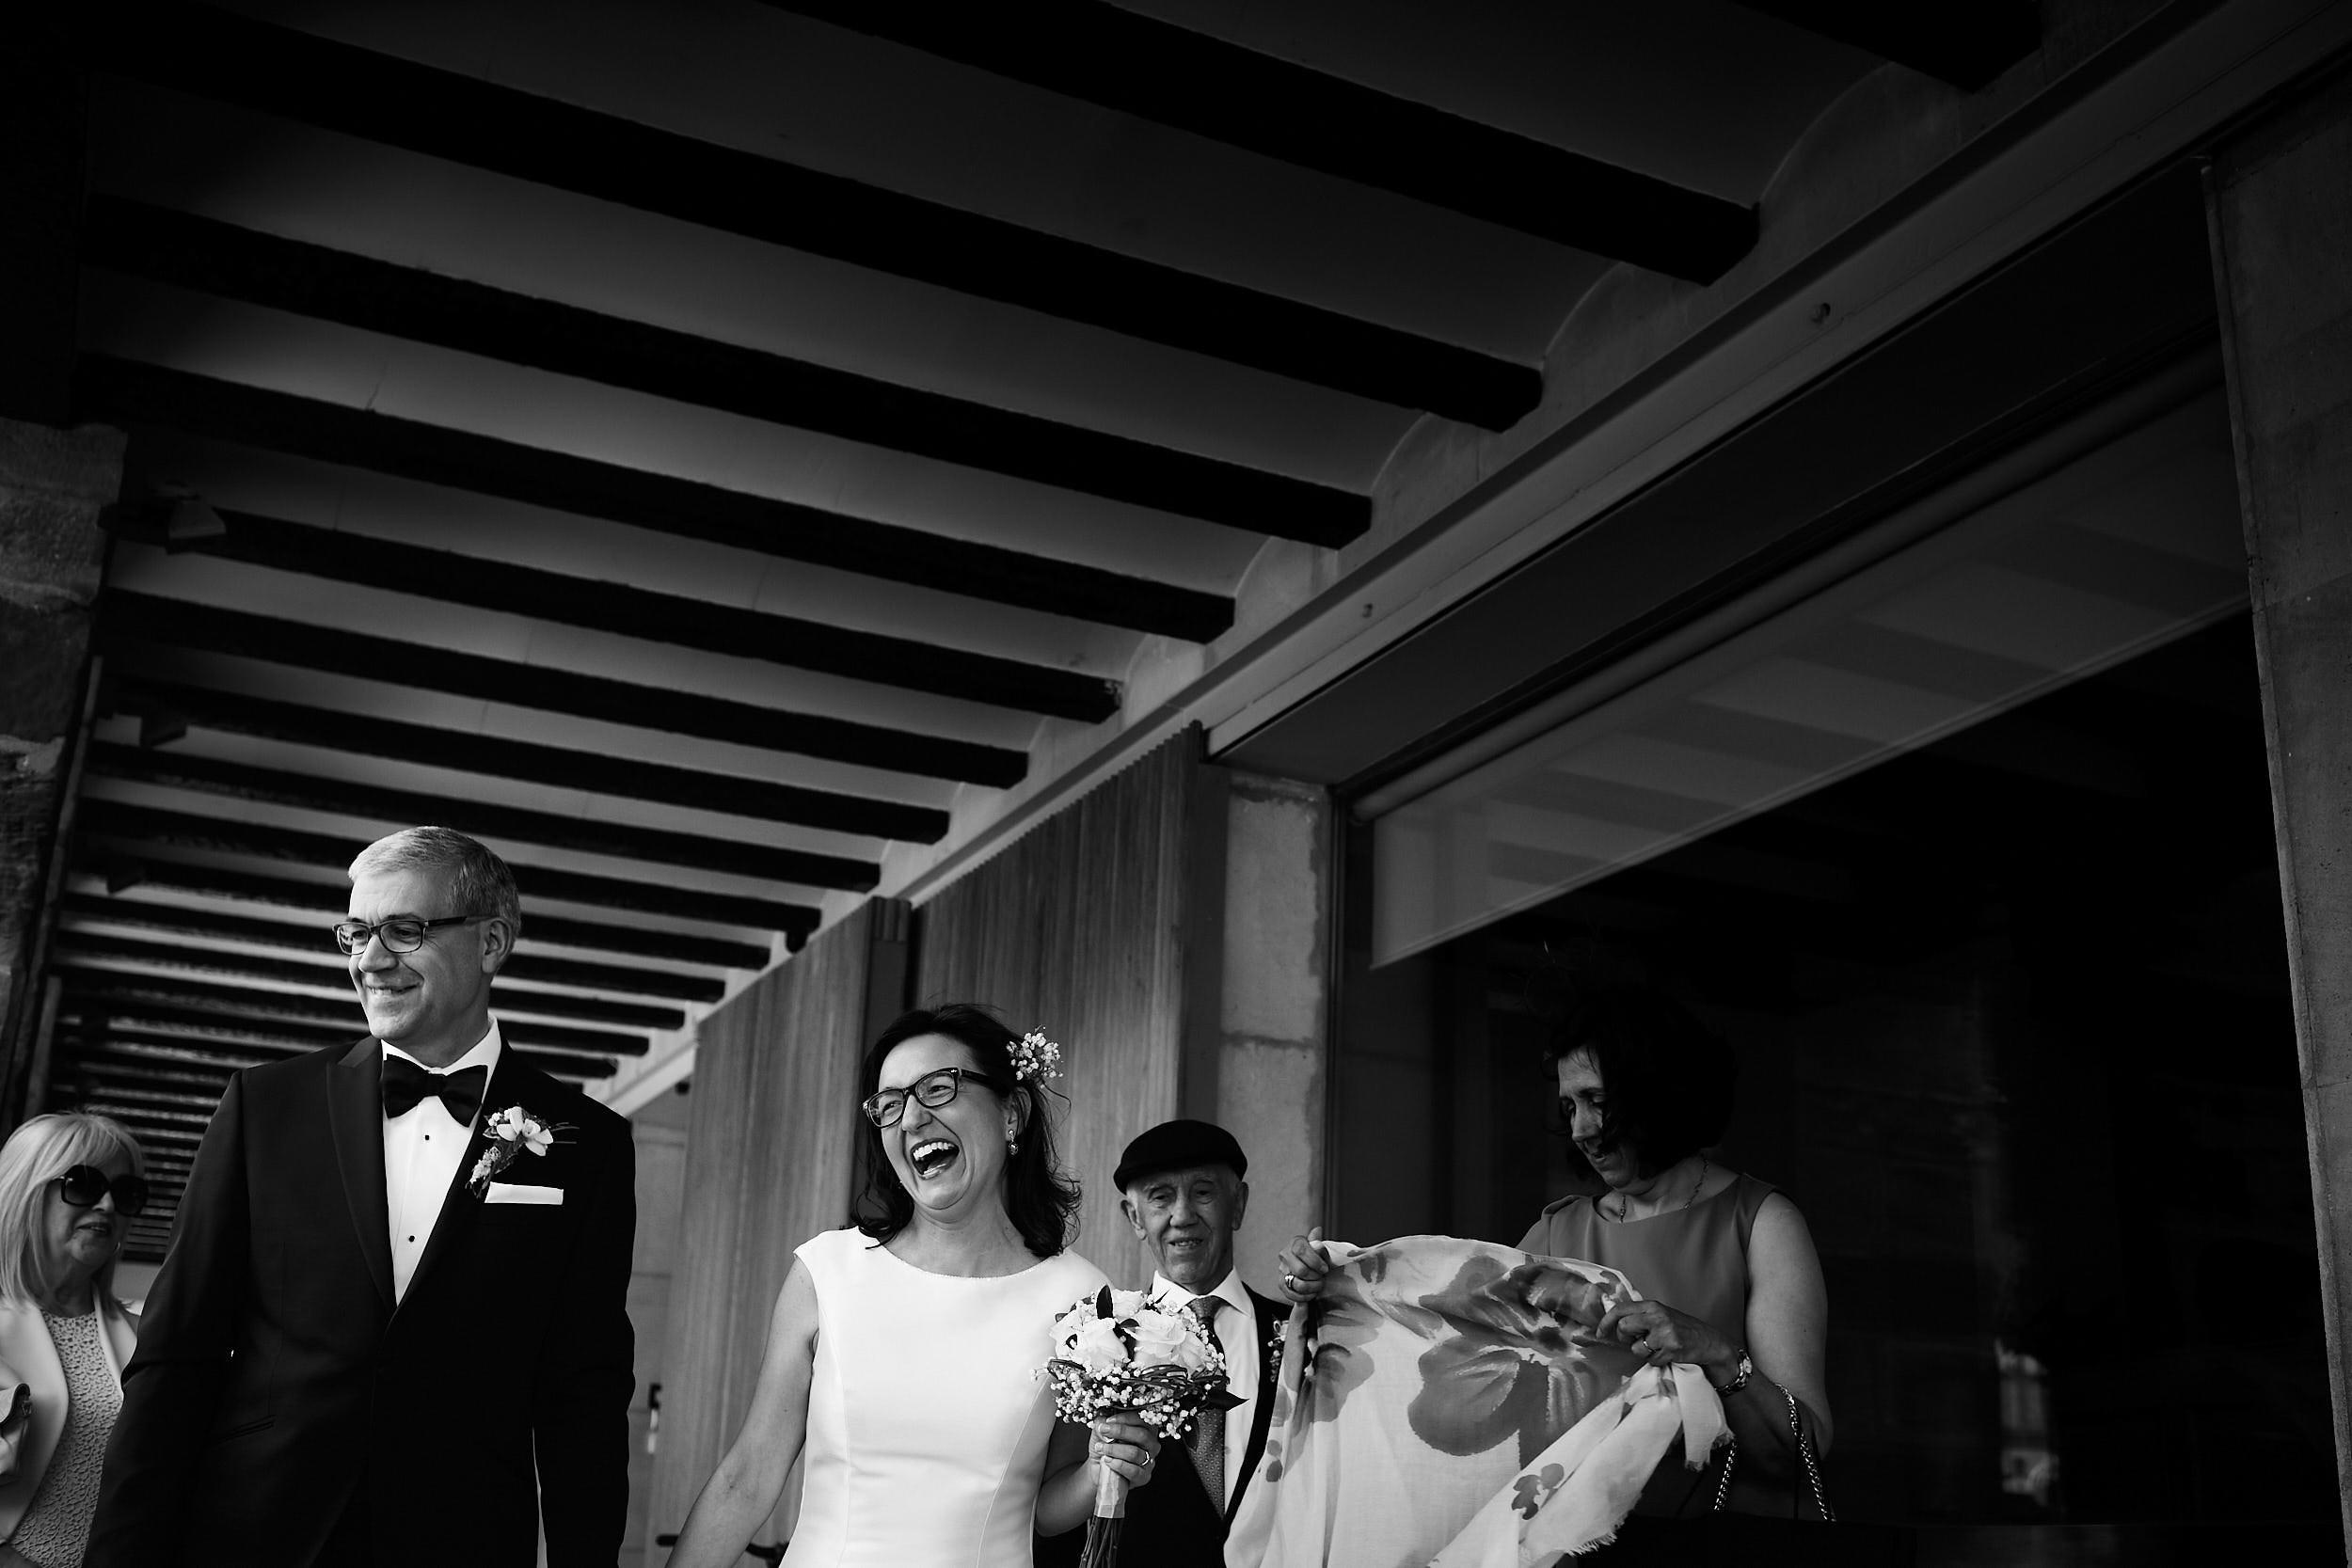 1806Basque_Country_Rioja_Wedding_Photographer_James_Sturcke_0005.jpg